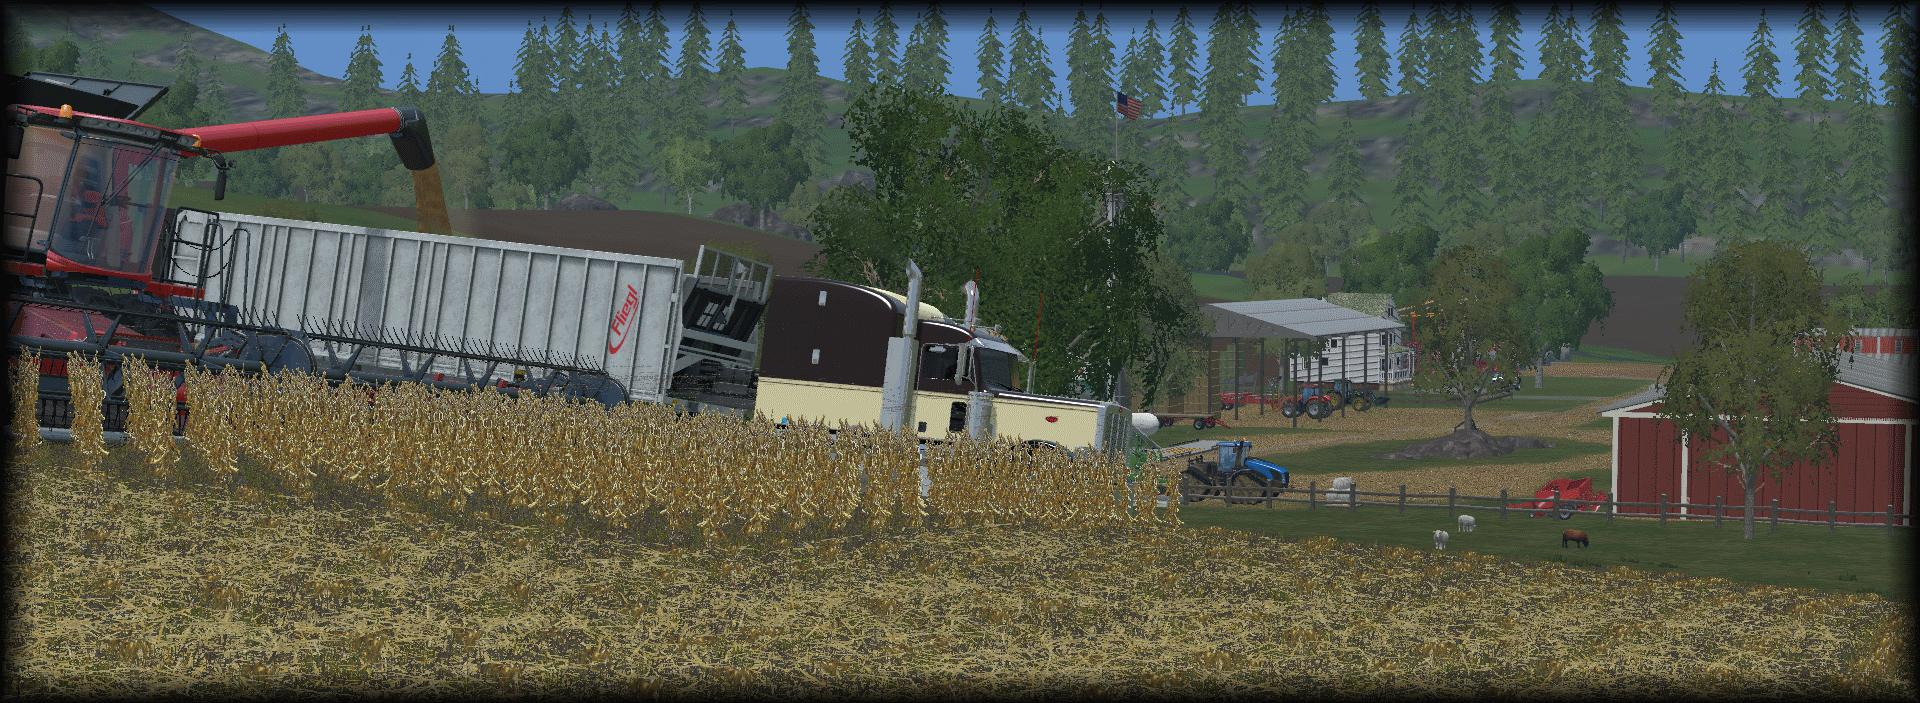 Farm Pond Fertilizer